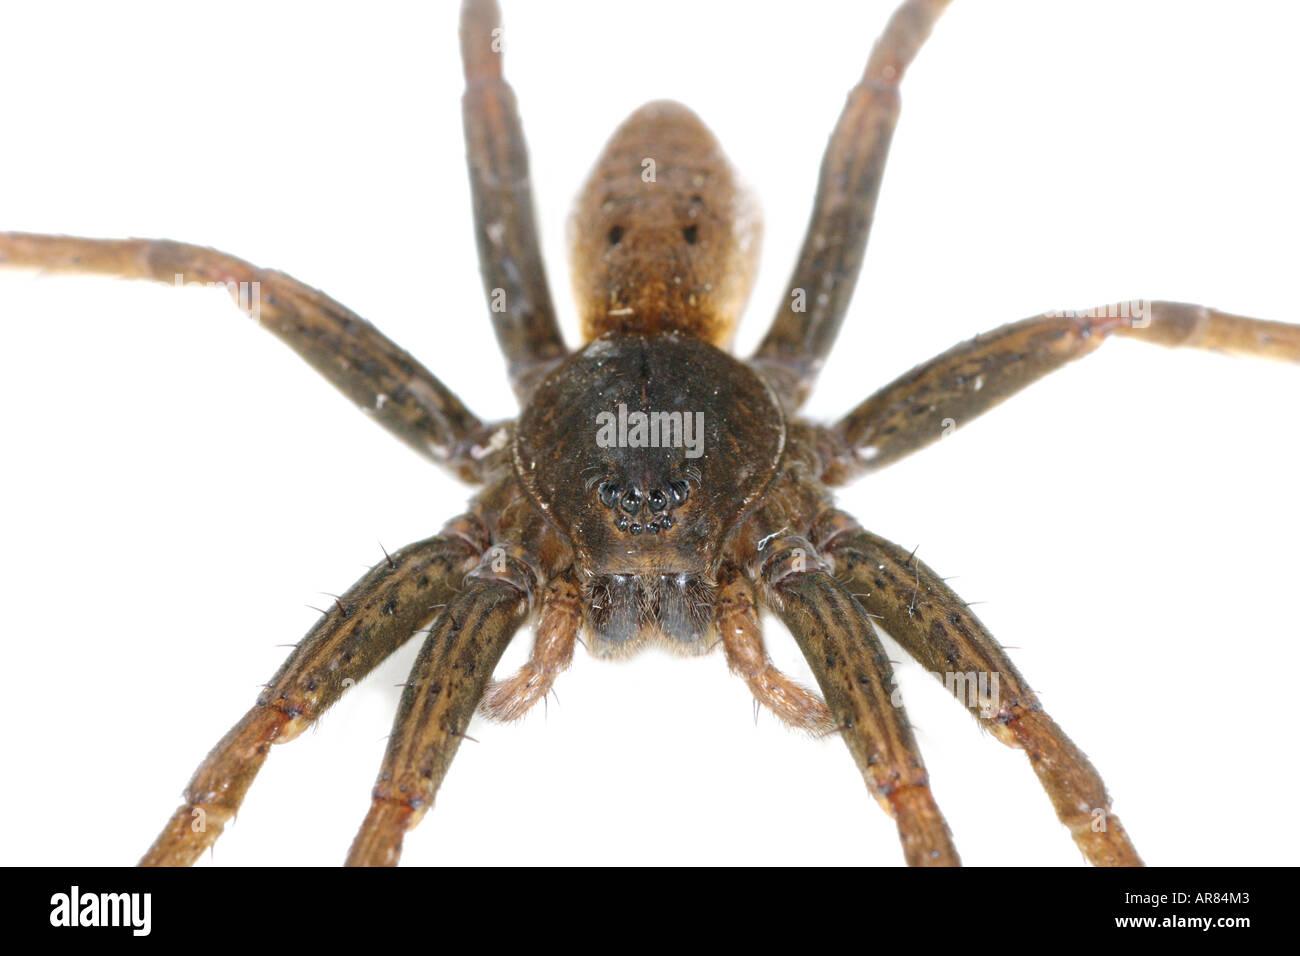 Fen Raft Spider Dolomedes plantarius, a fishing spider, on white background Stock Photo